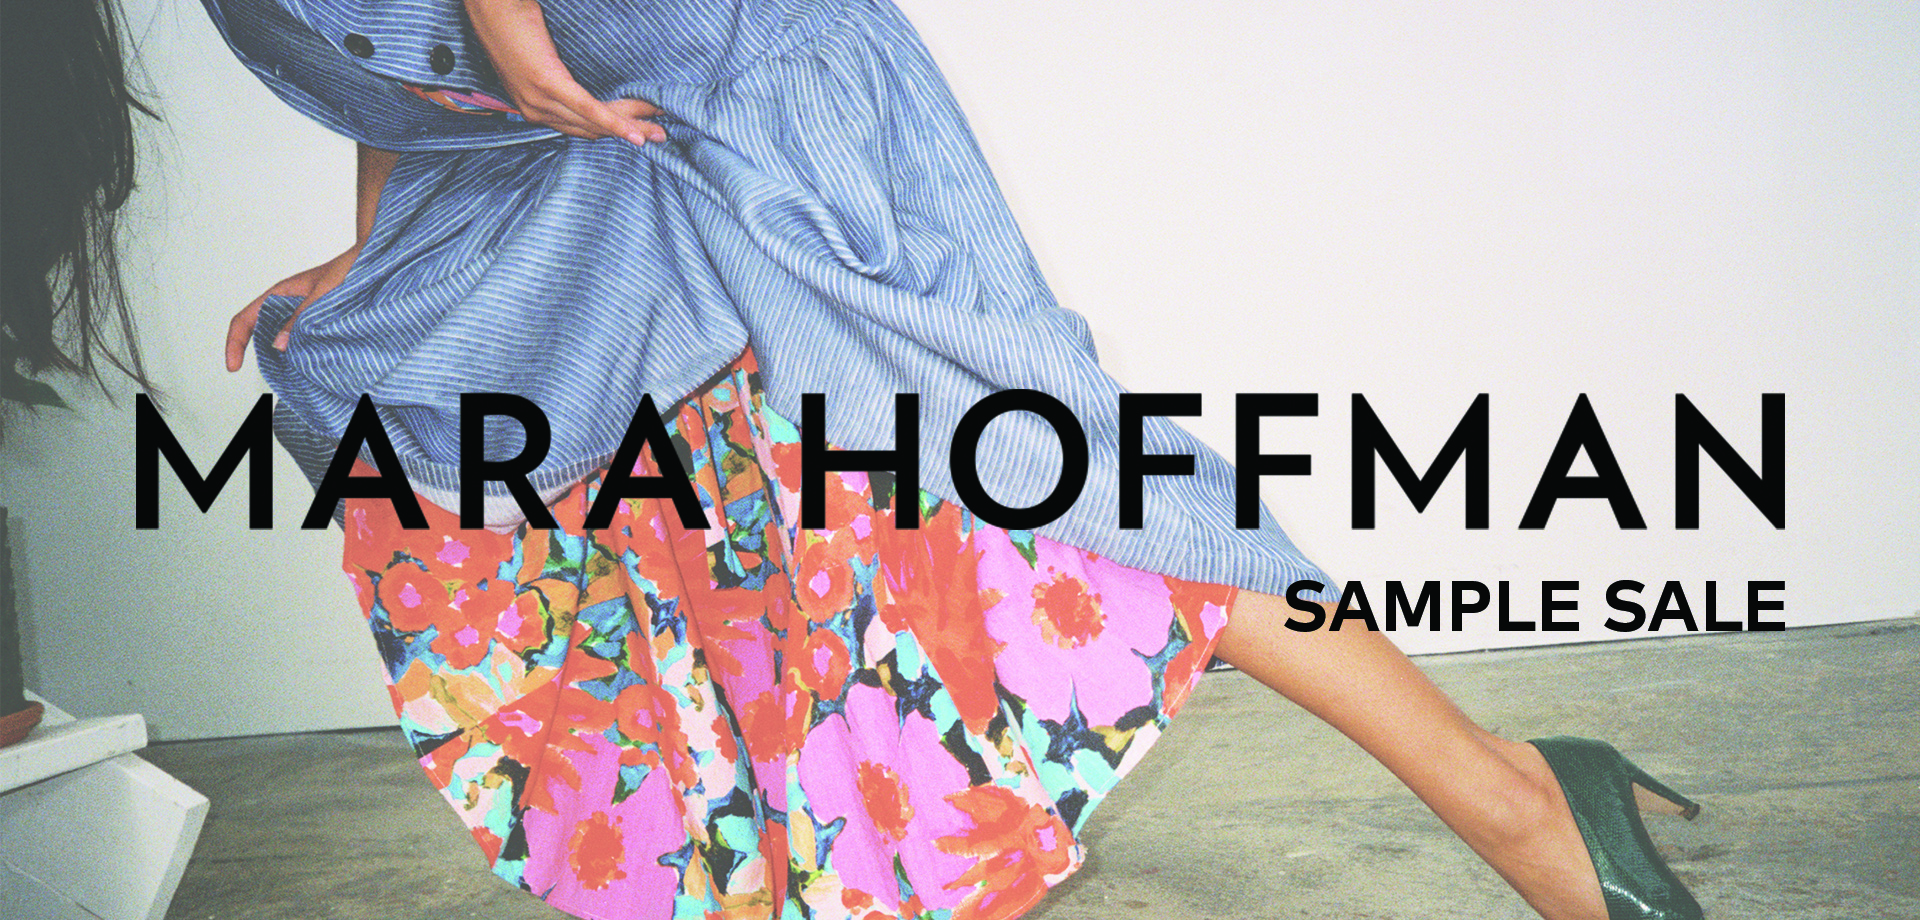 BANNER_Mara-Hoffman-Sample-Sale_260NY_June-19.jpg